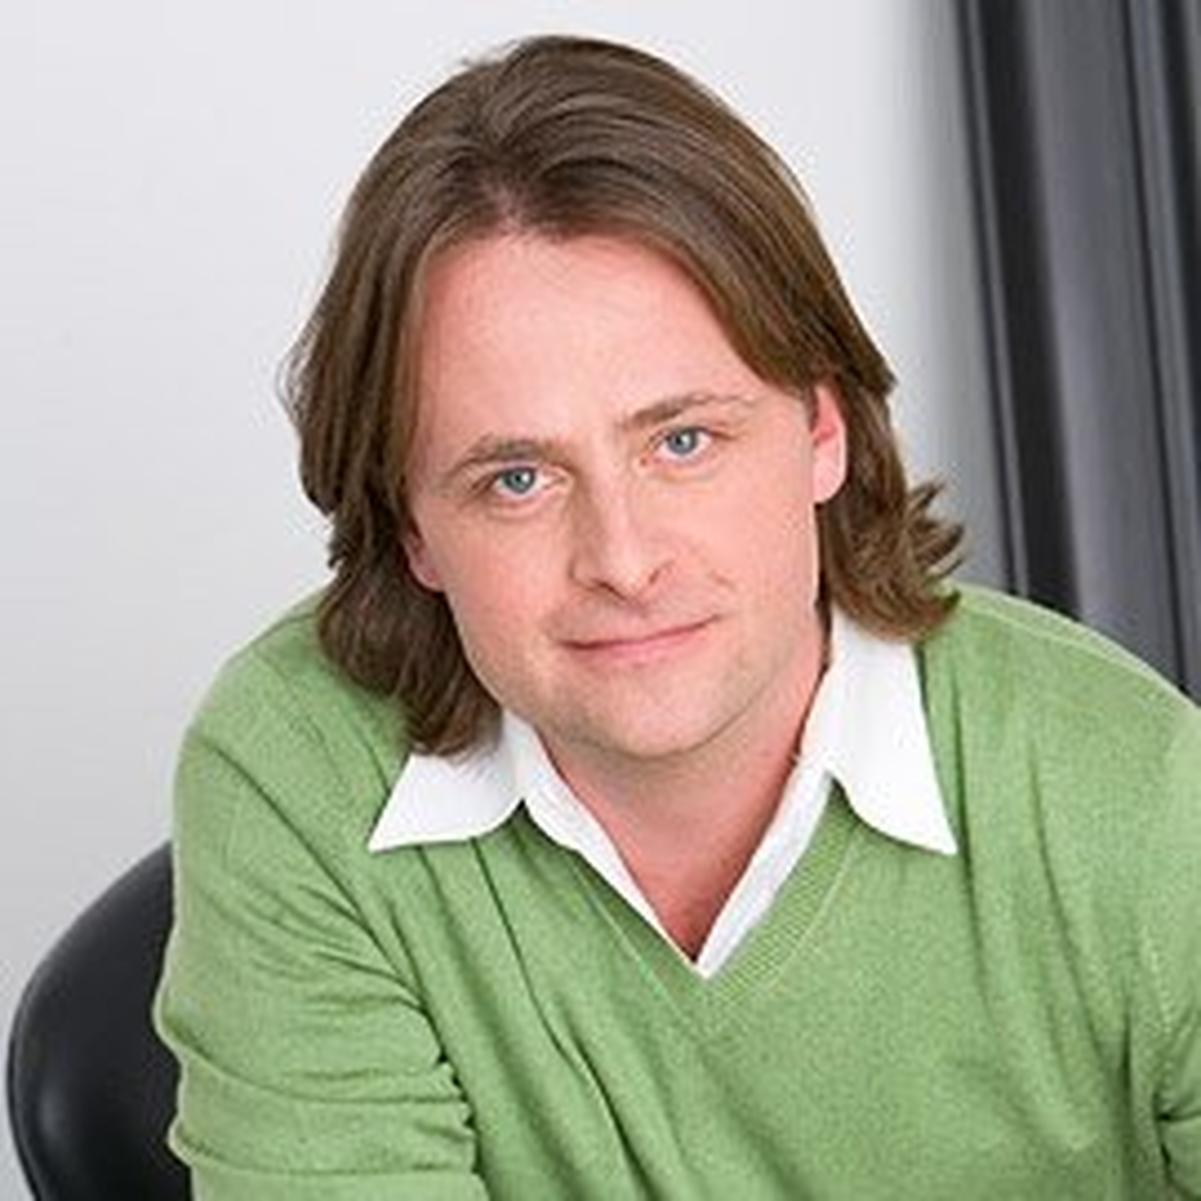 Stephen Saint-Onge